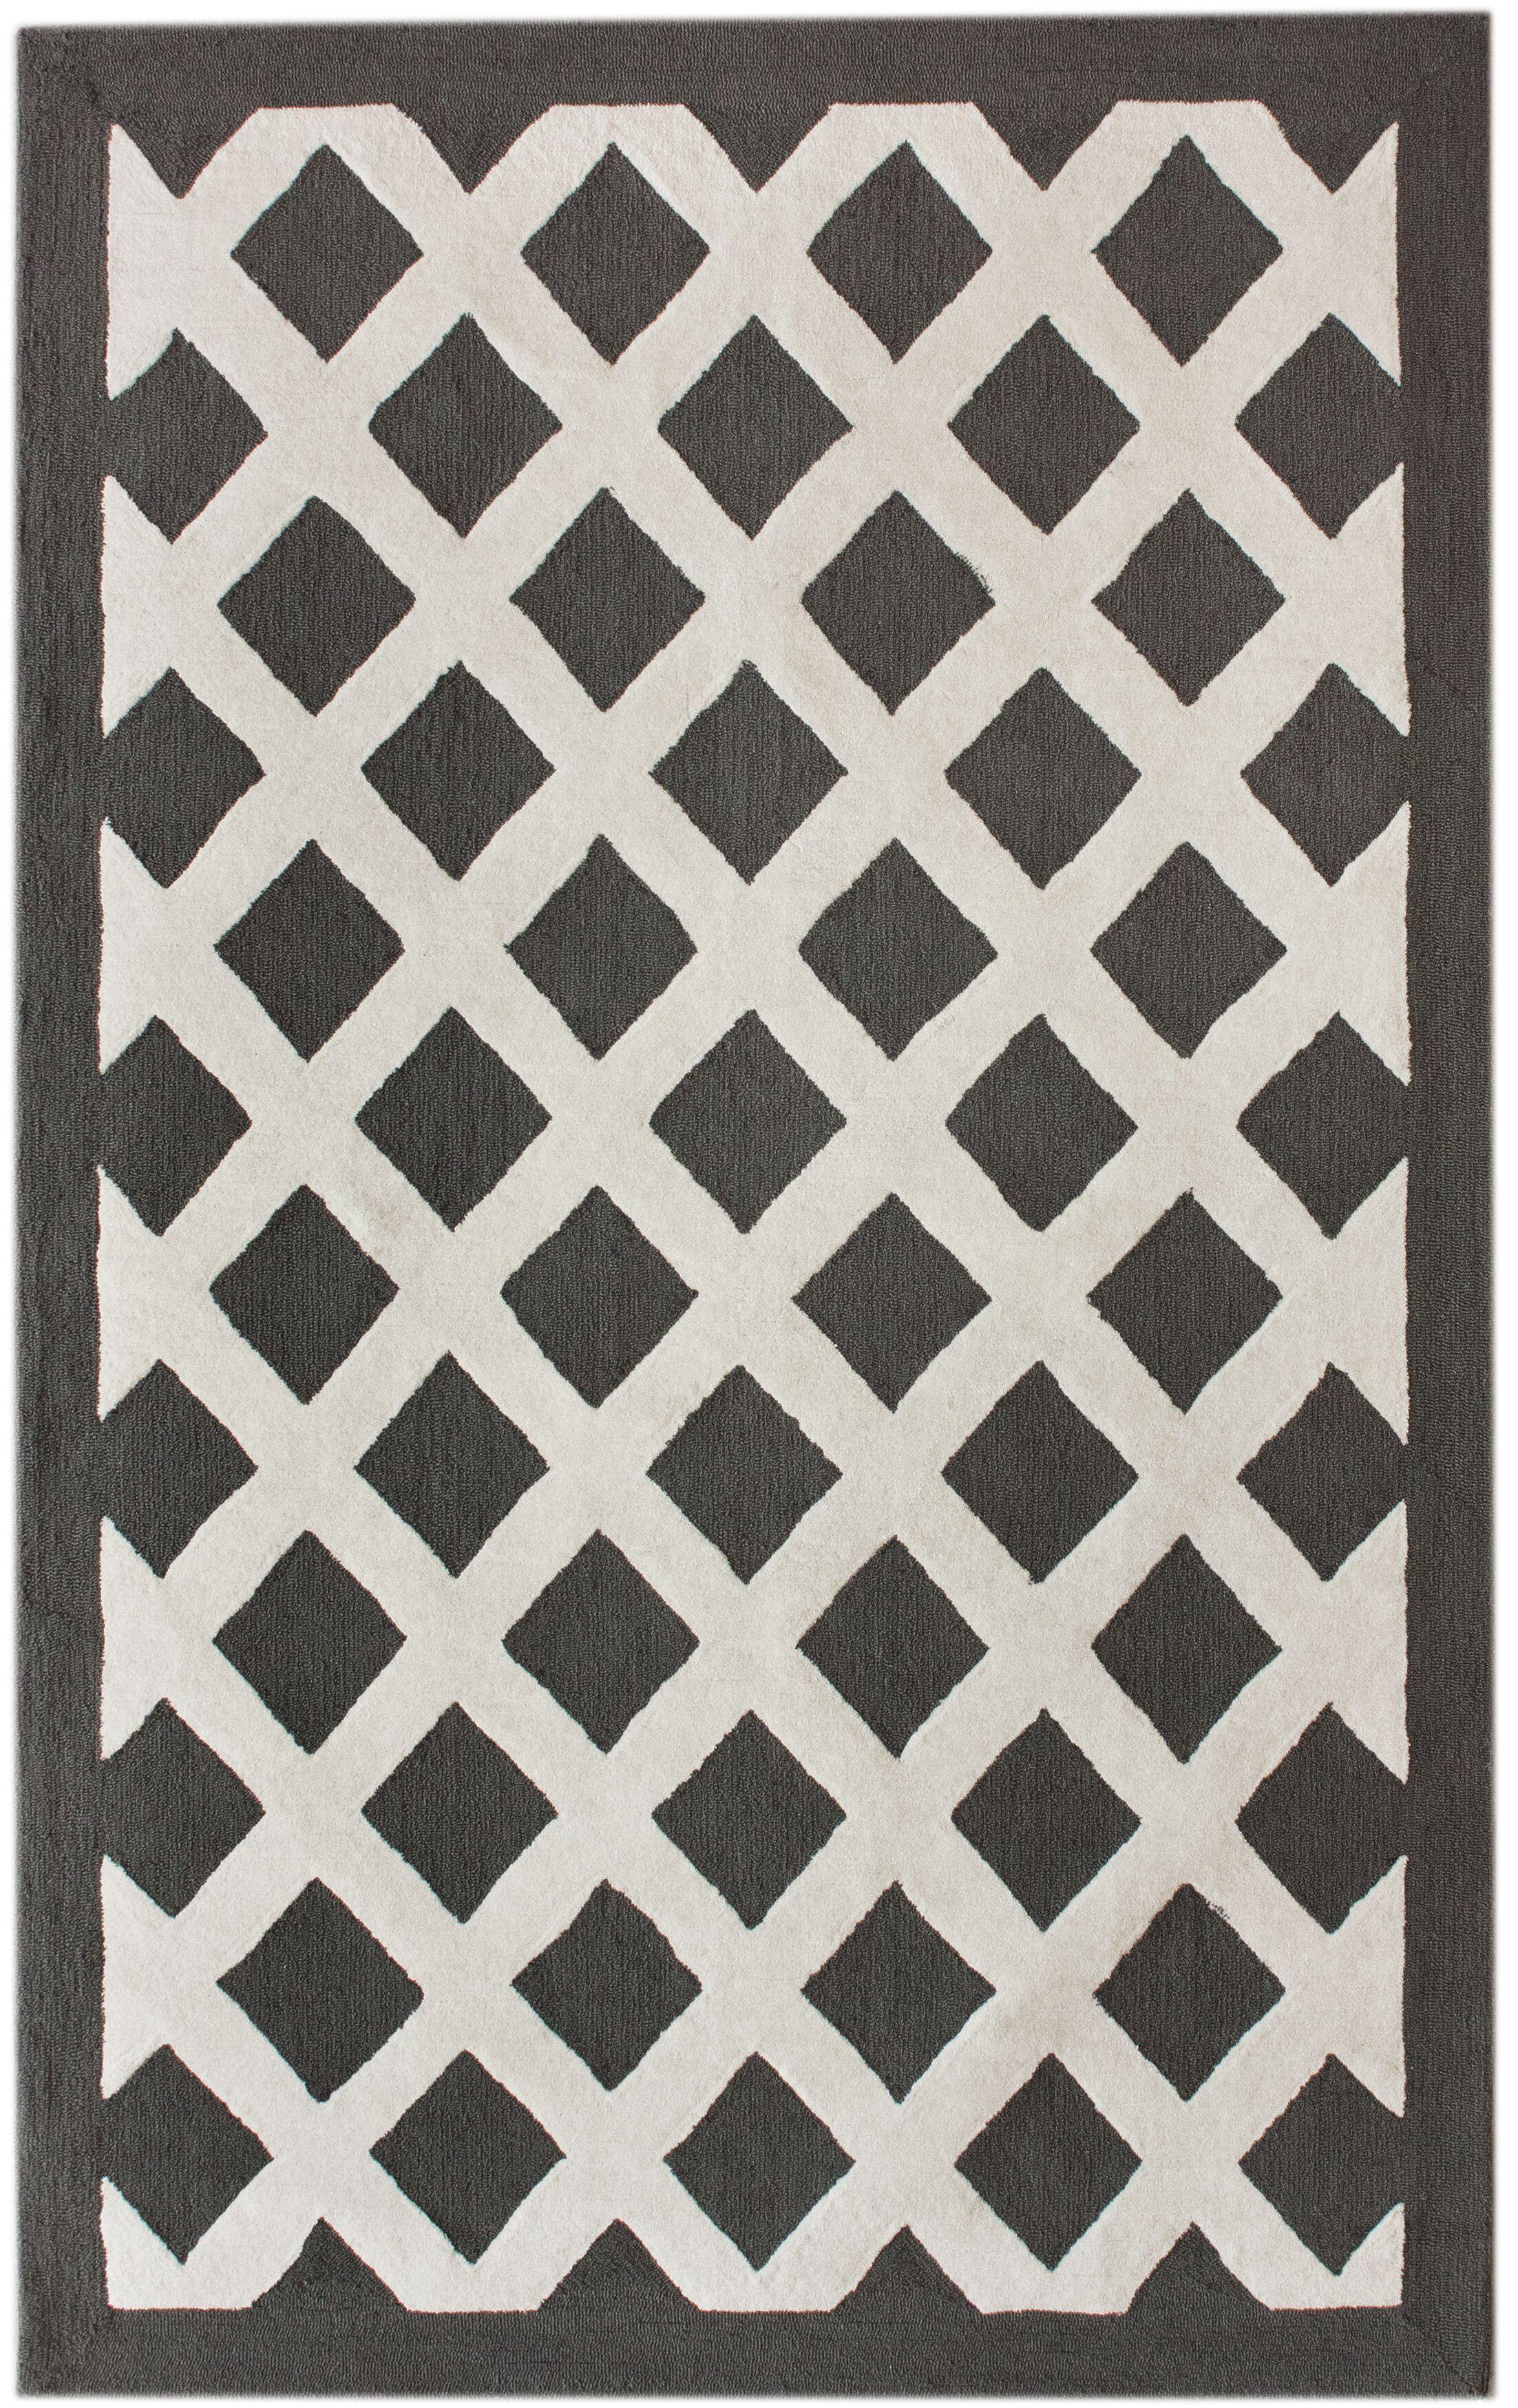 Marrakesh Konico Hand-Tufted Black/Gray Area Rug Rug Size: Rectangle 5' x 8'